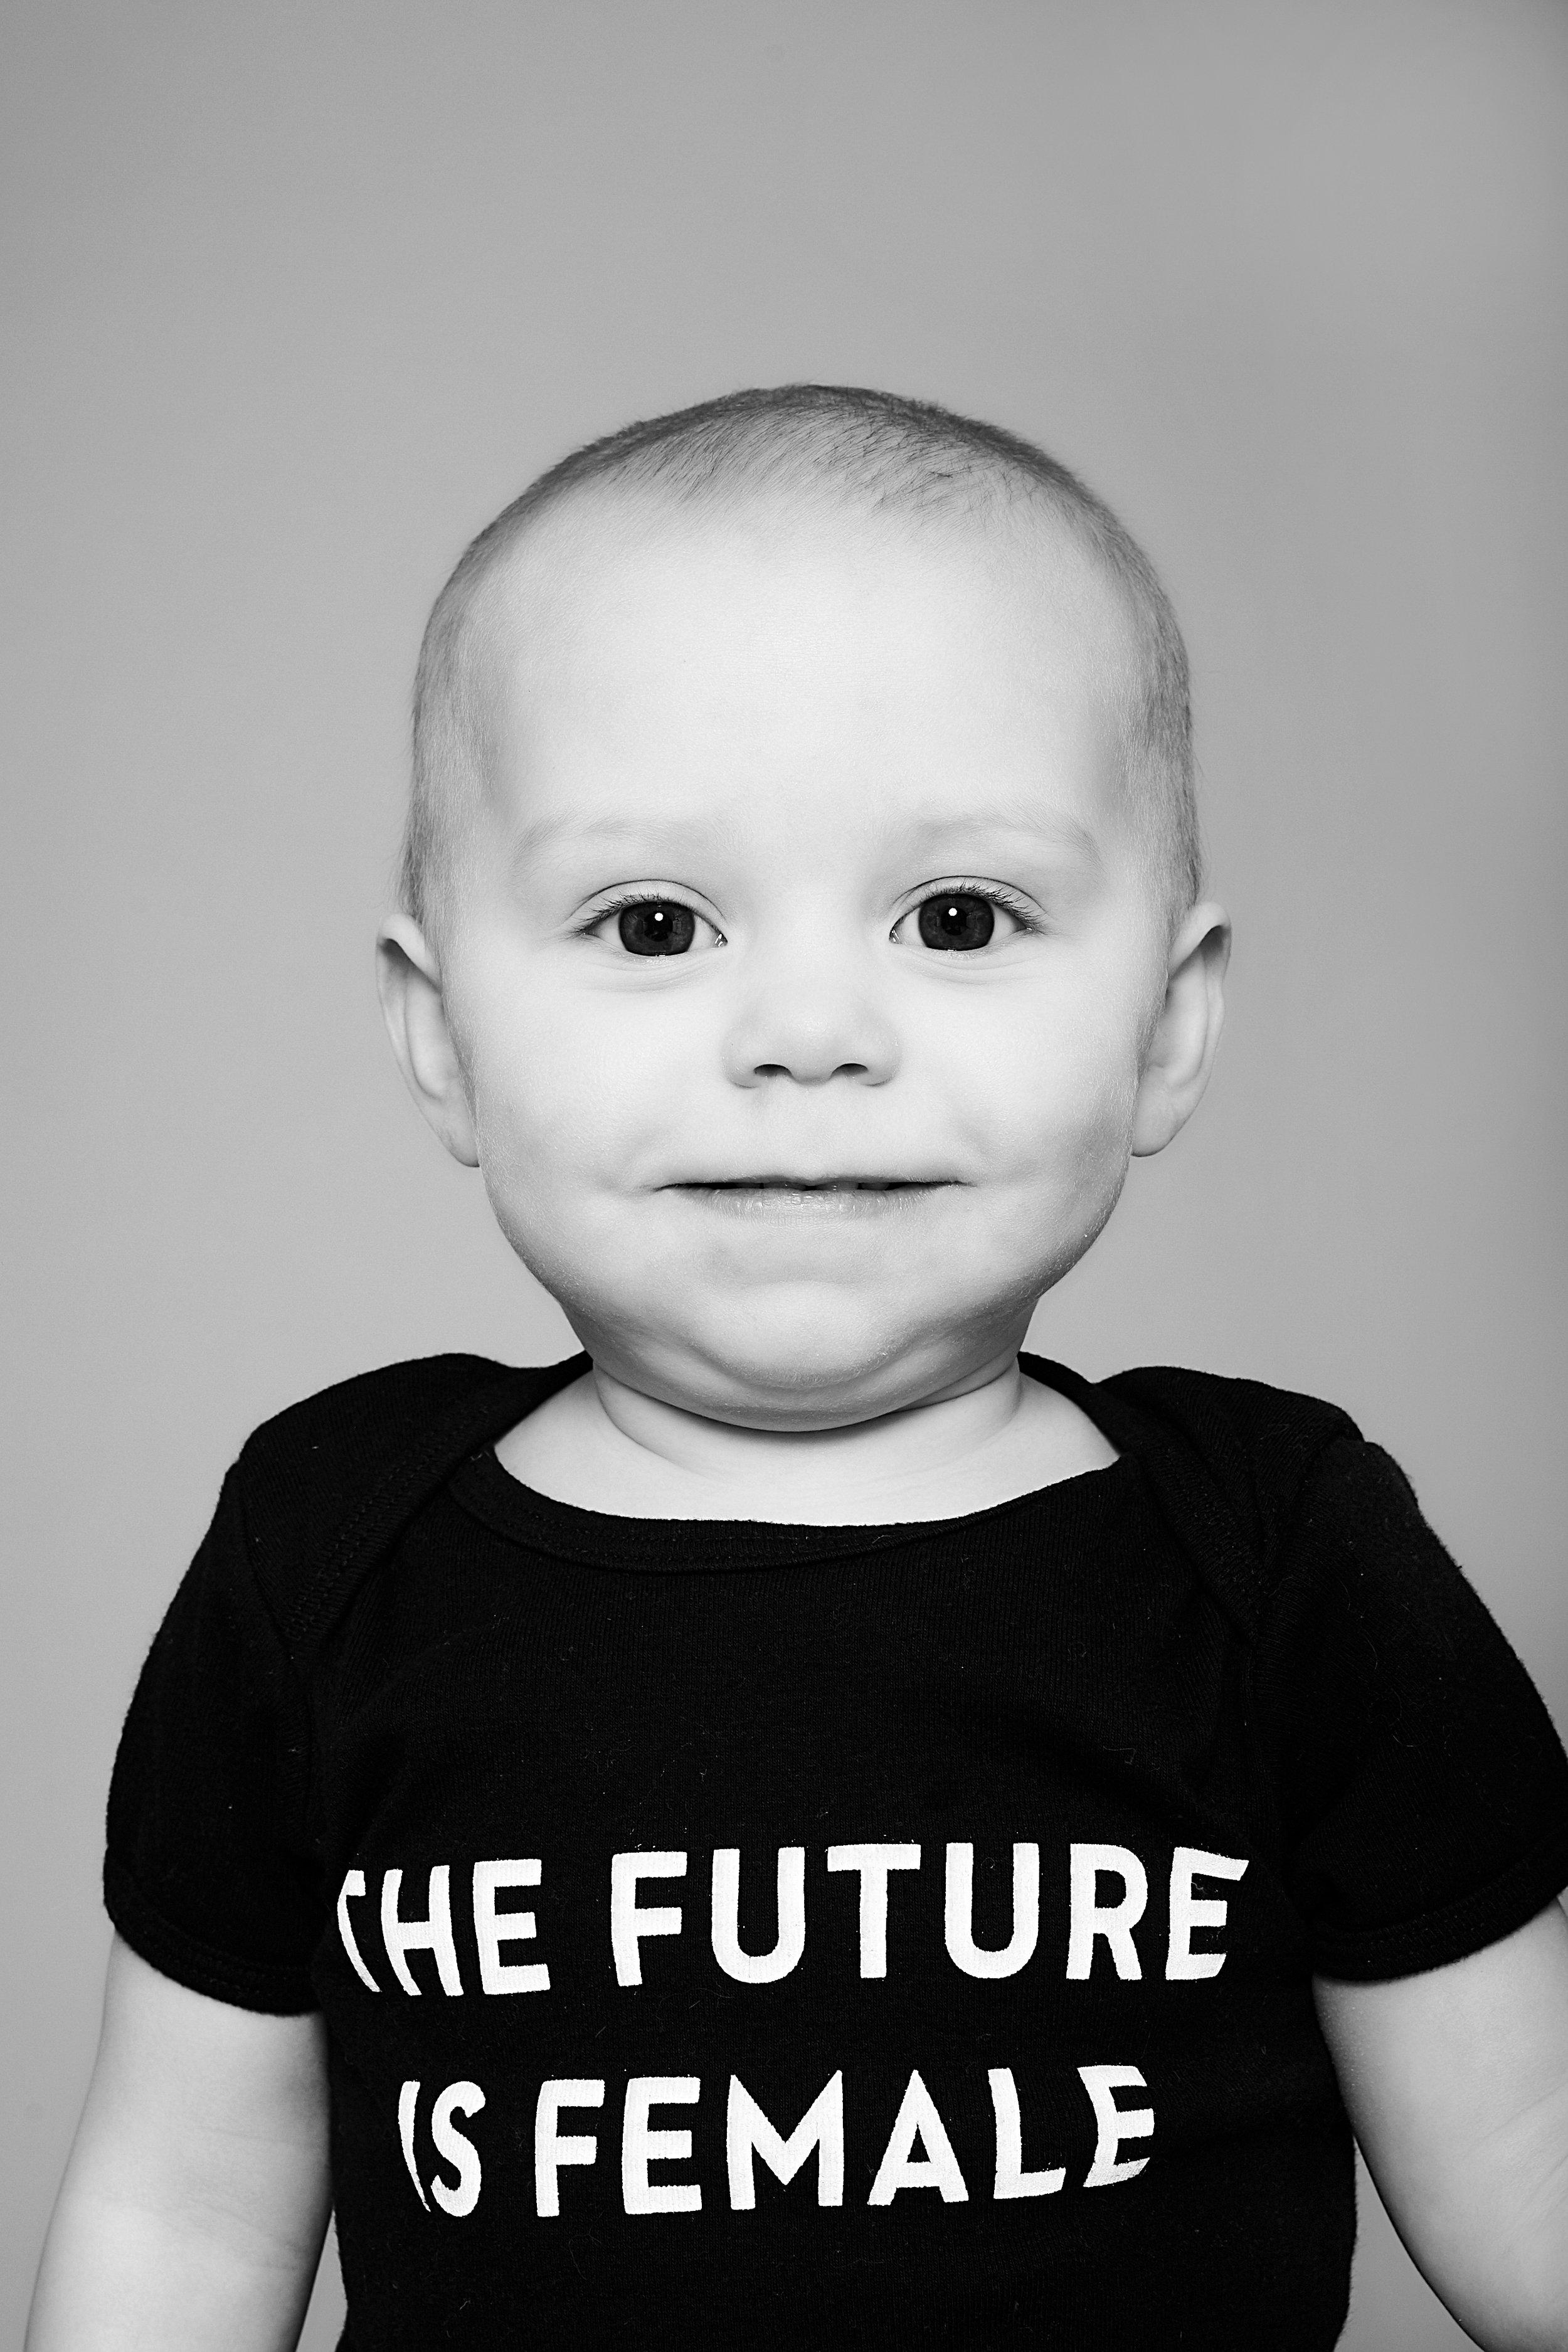 2017_the_future_is_female_018_bw_r.jpg